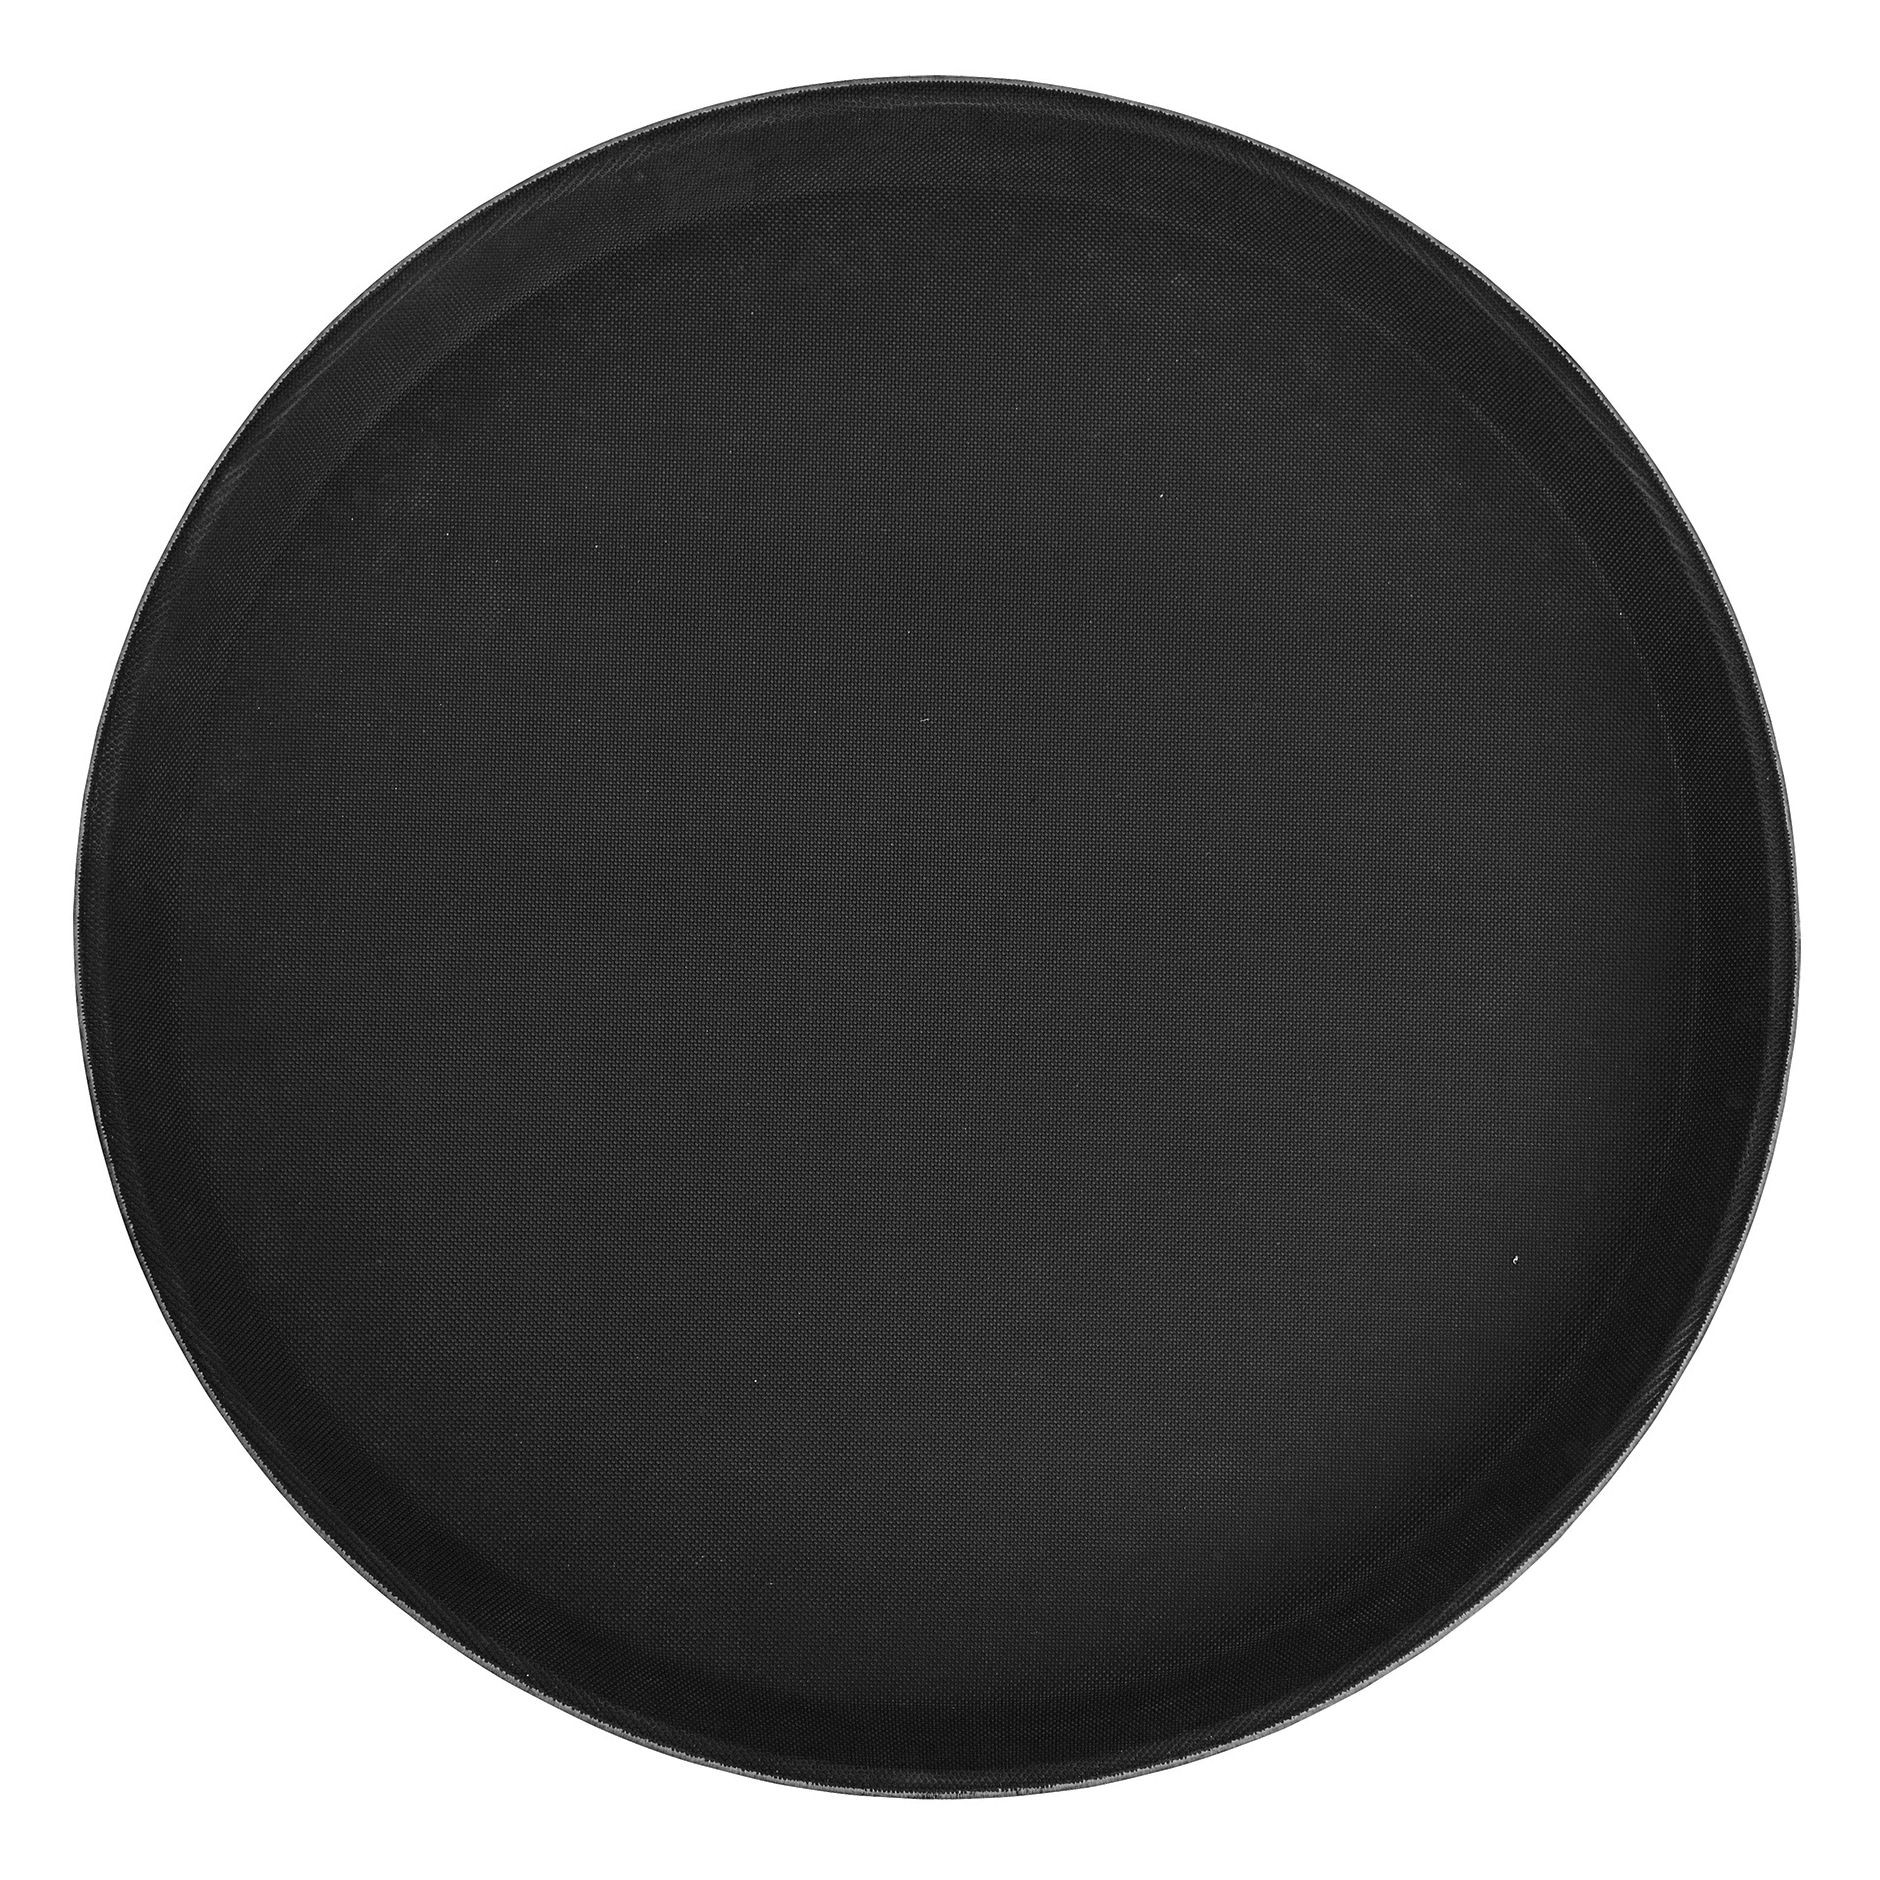 "Winco TFG-16K Black Round Non-Slip Fiberglass Tray 16"""